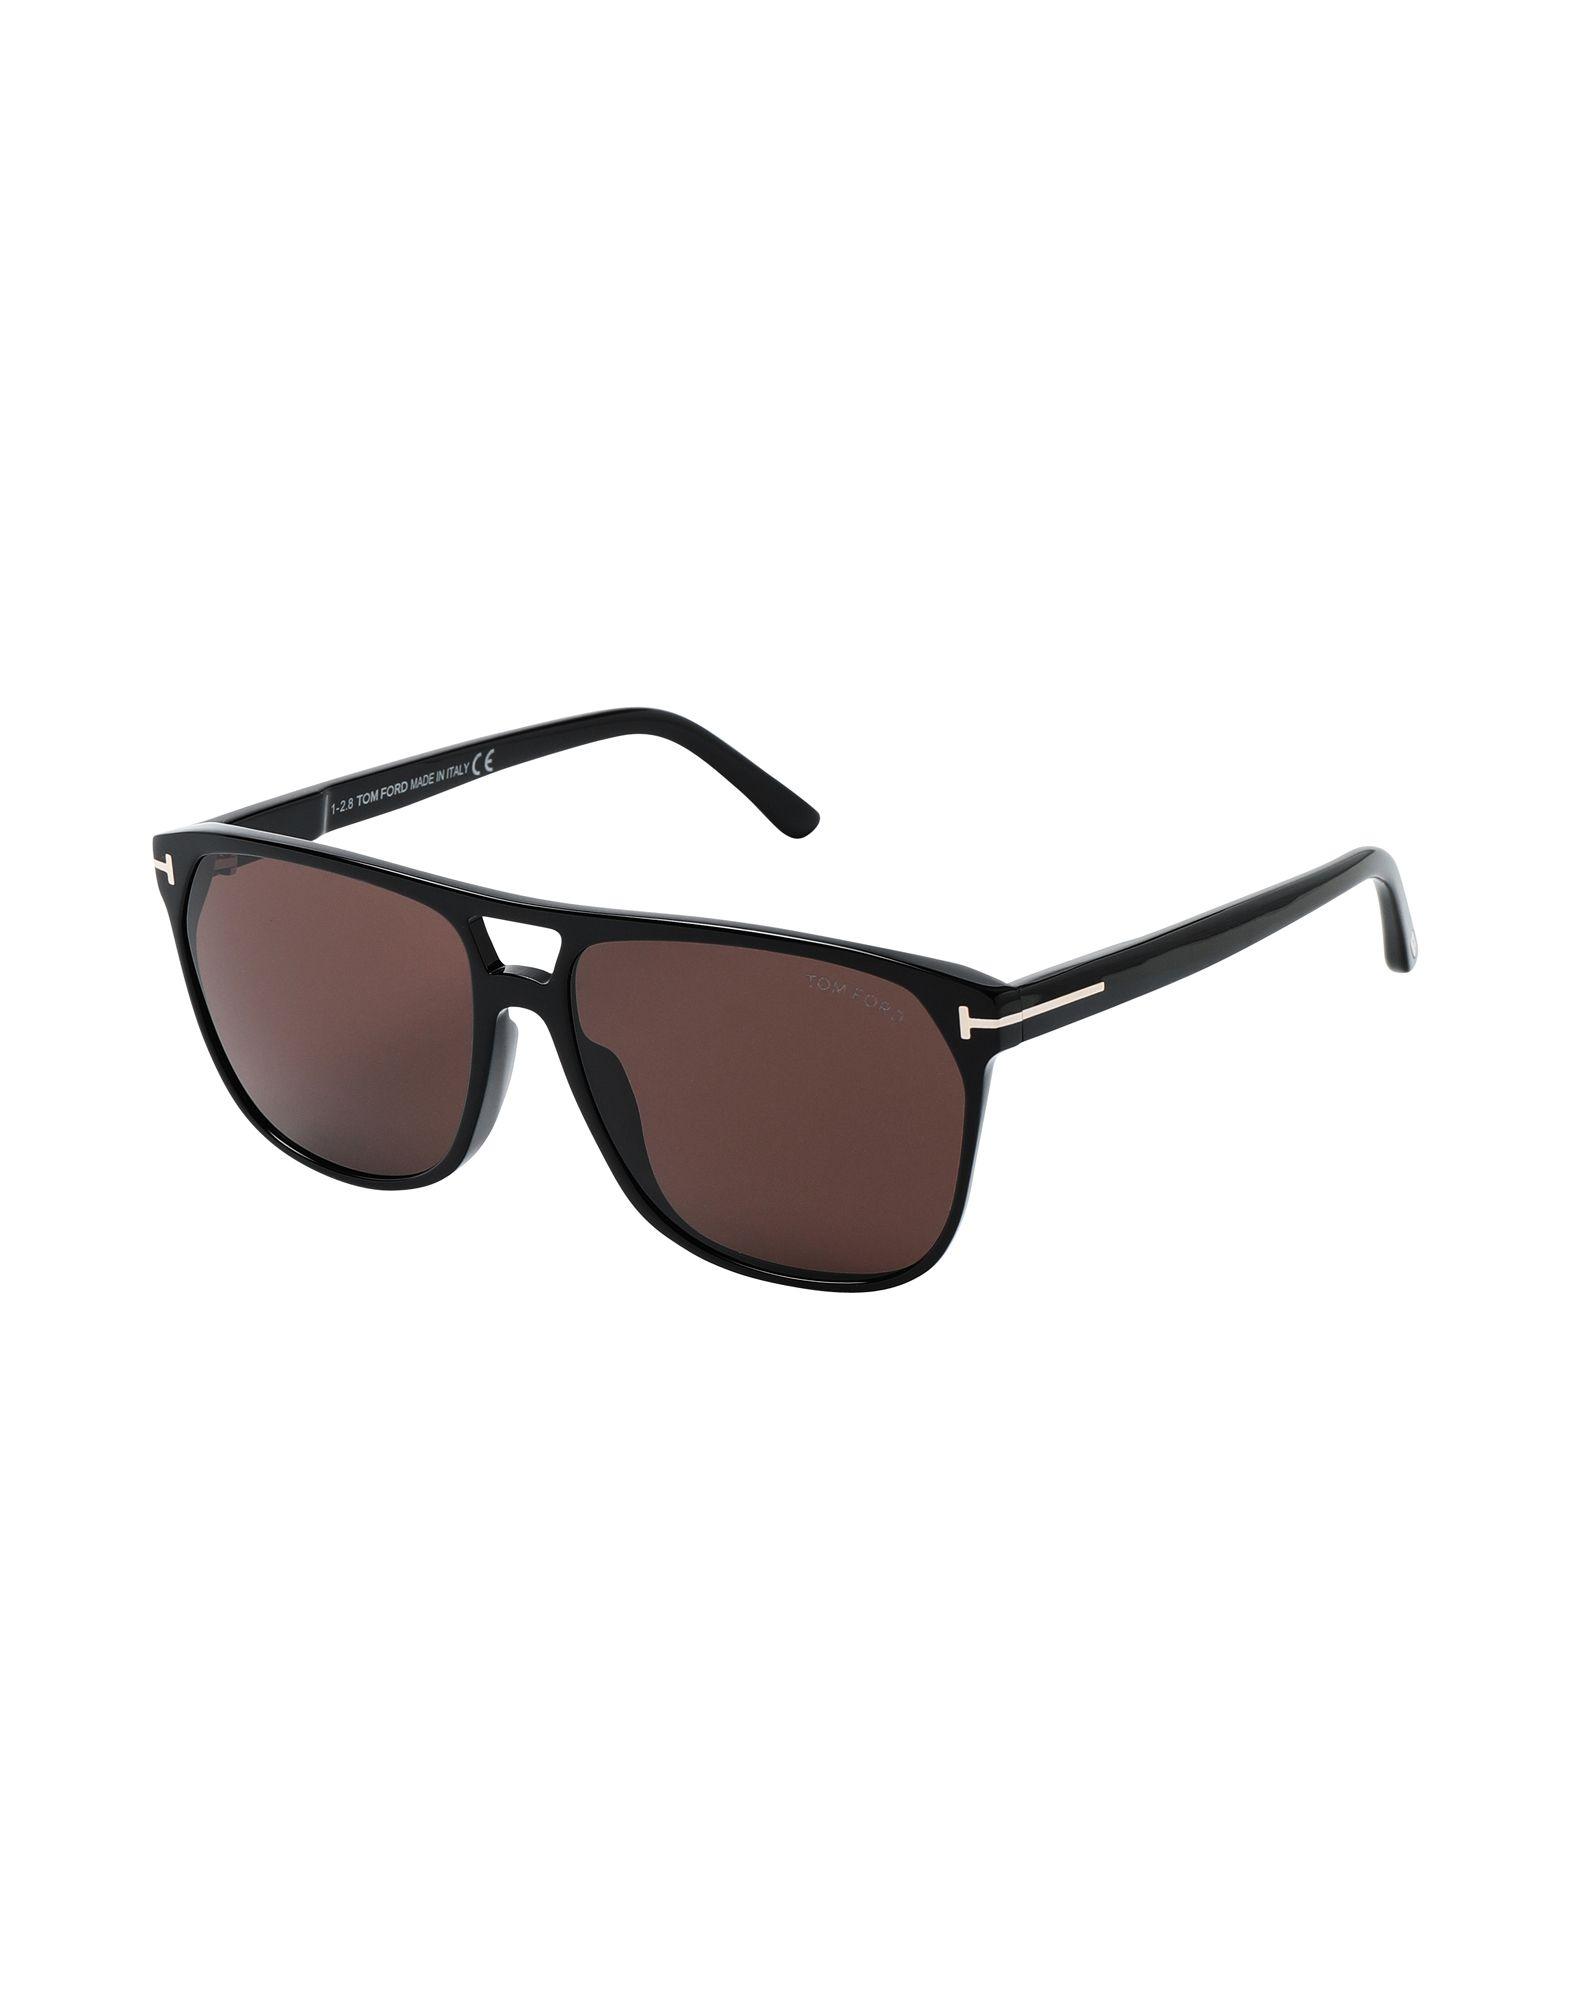 TOM FORD Солнечные очки web eyewear солнечные очки